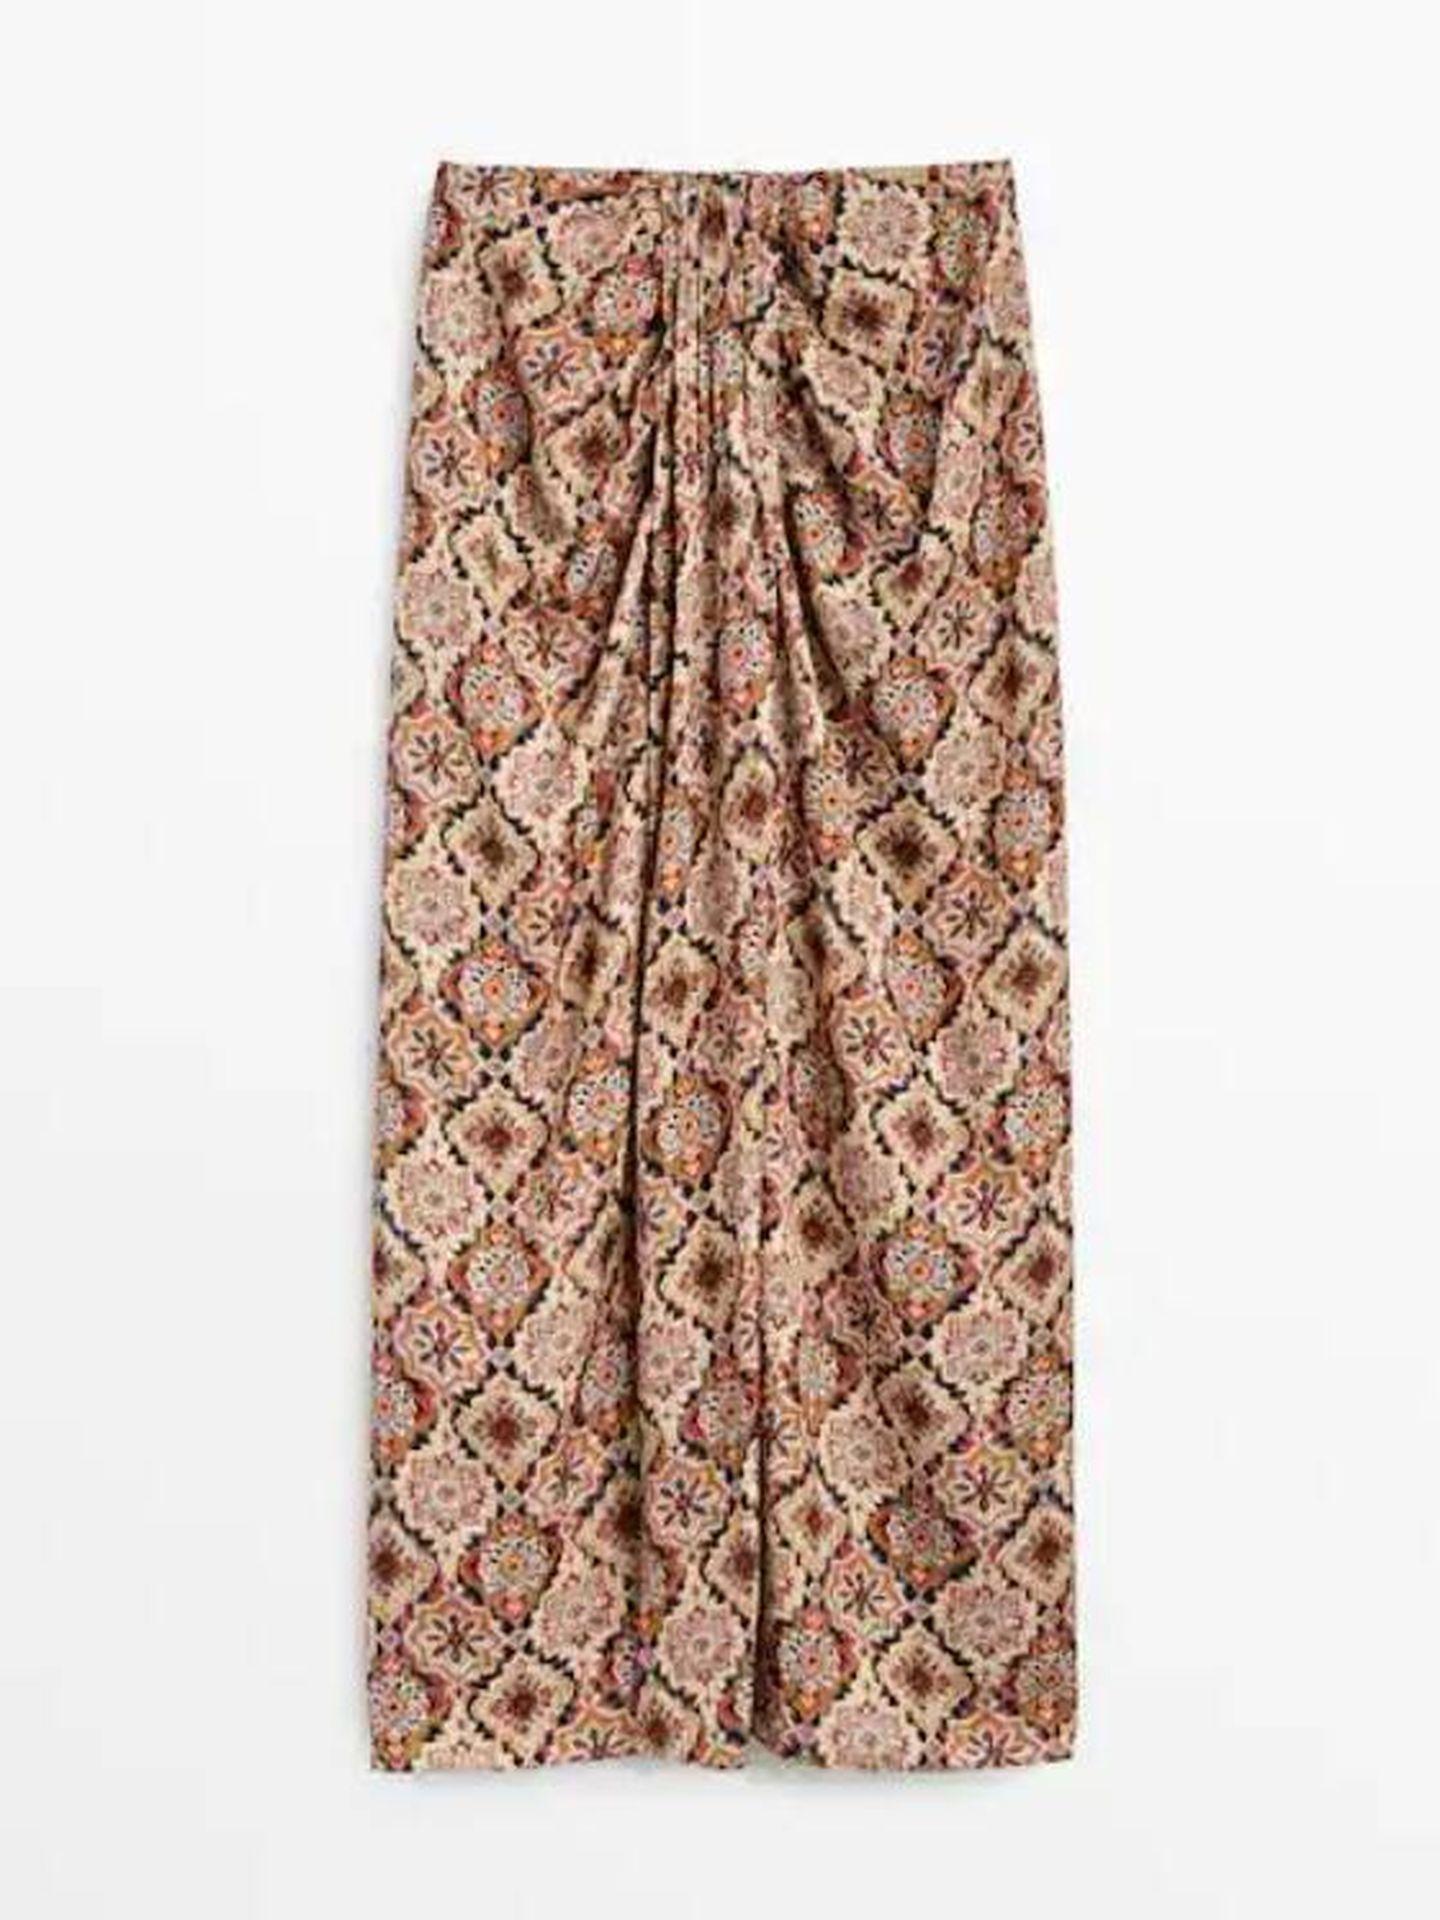 La falda con nudo de Massimo Dutti. (Cortesía)